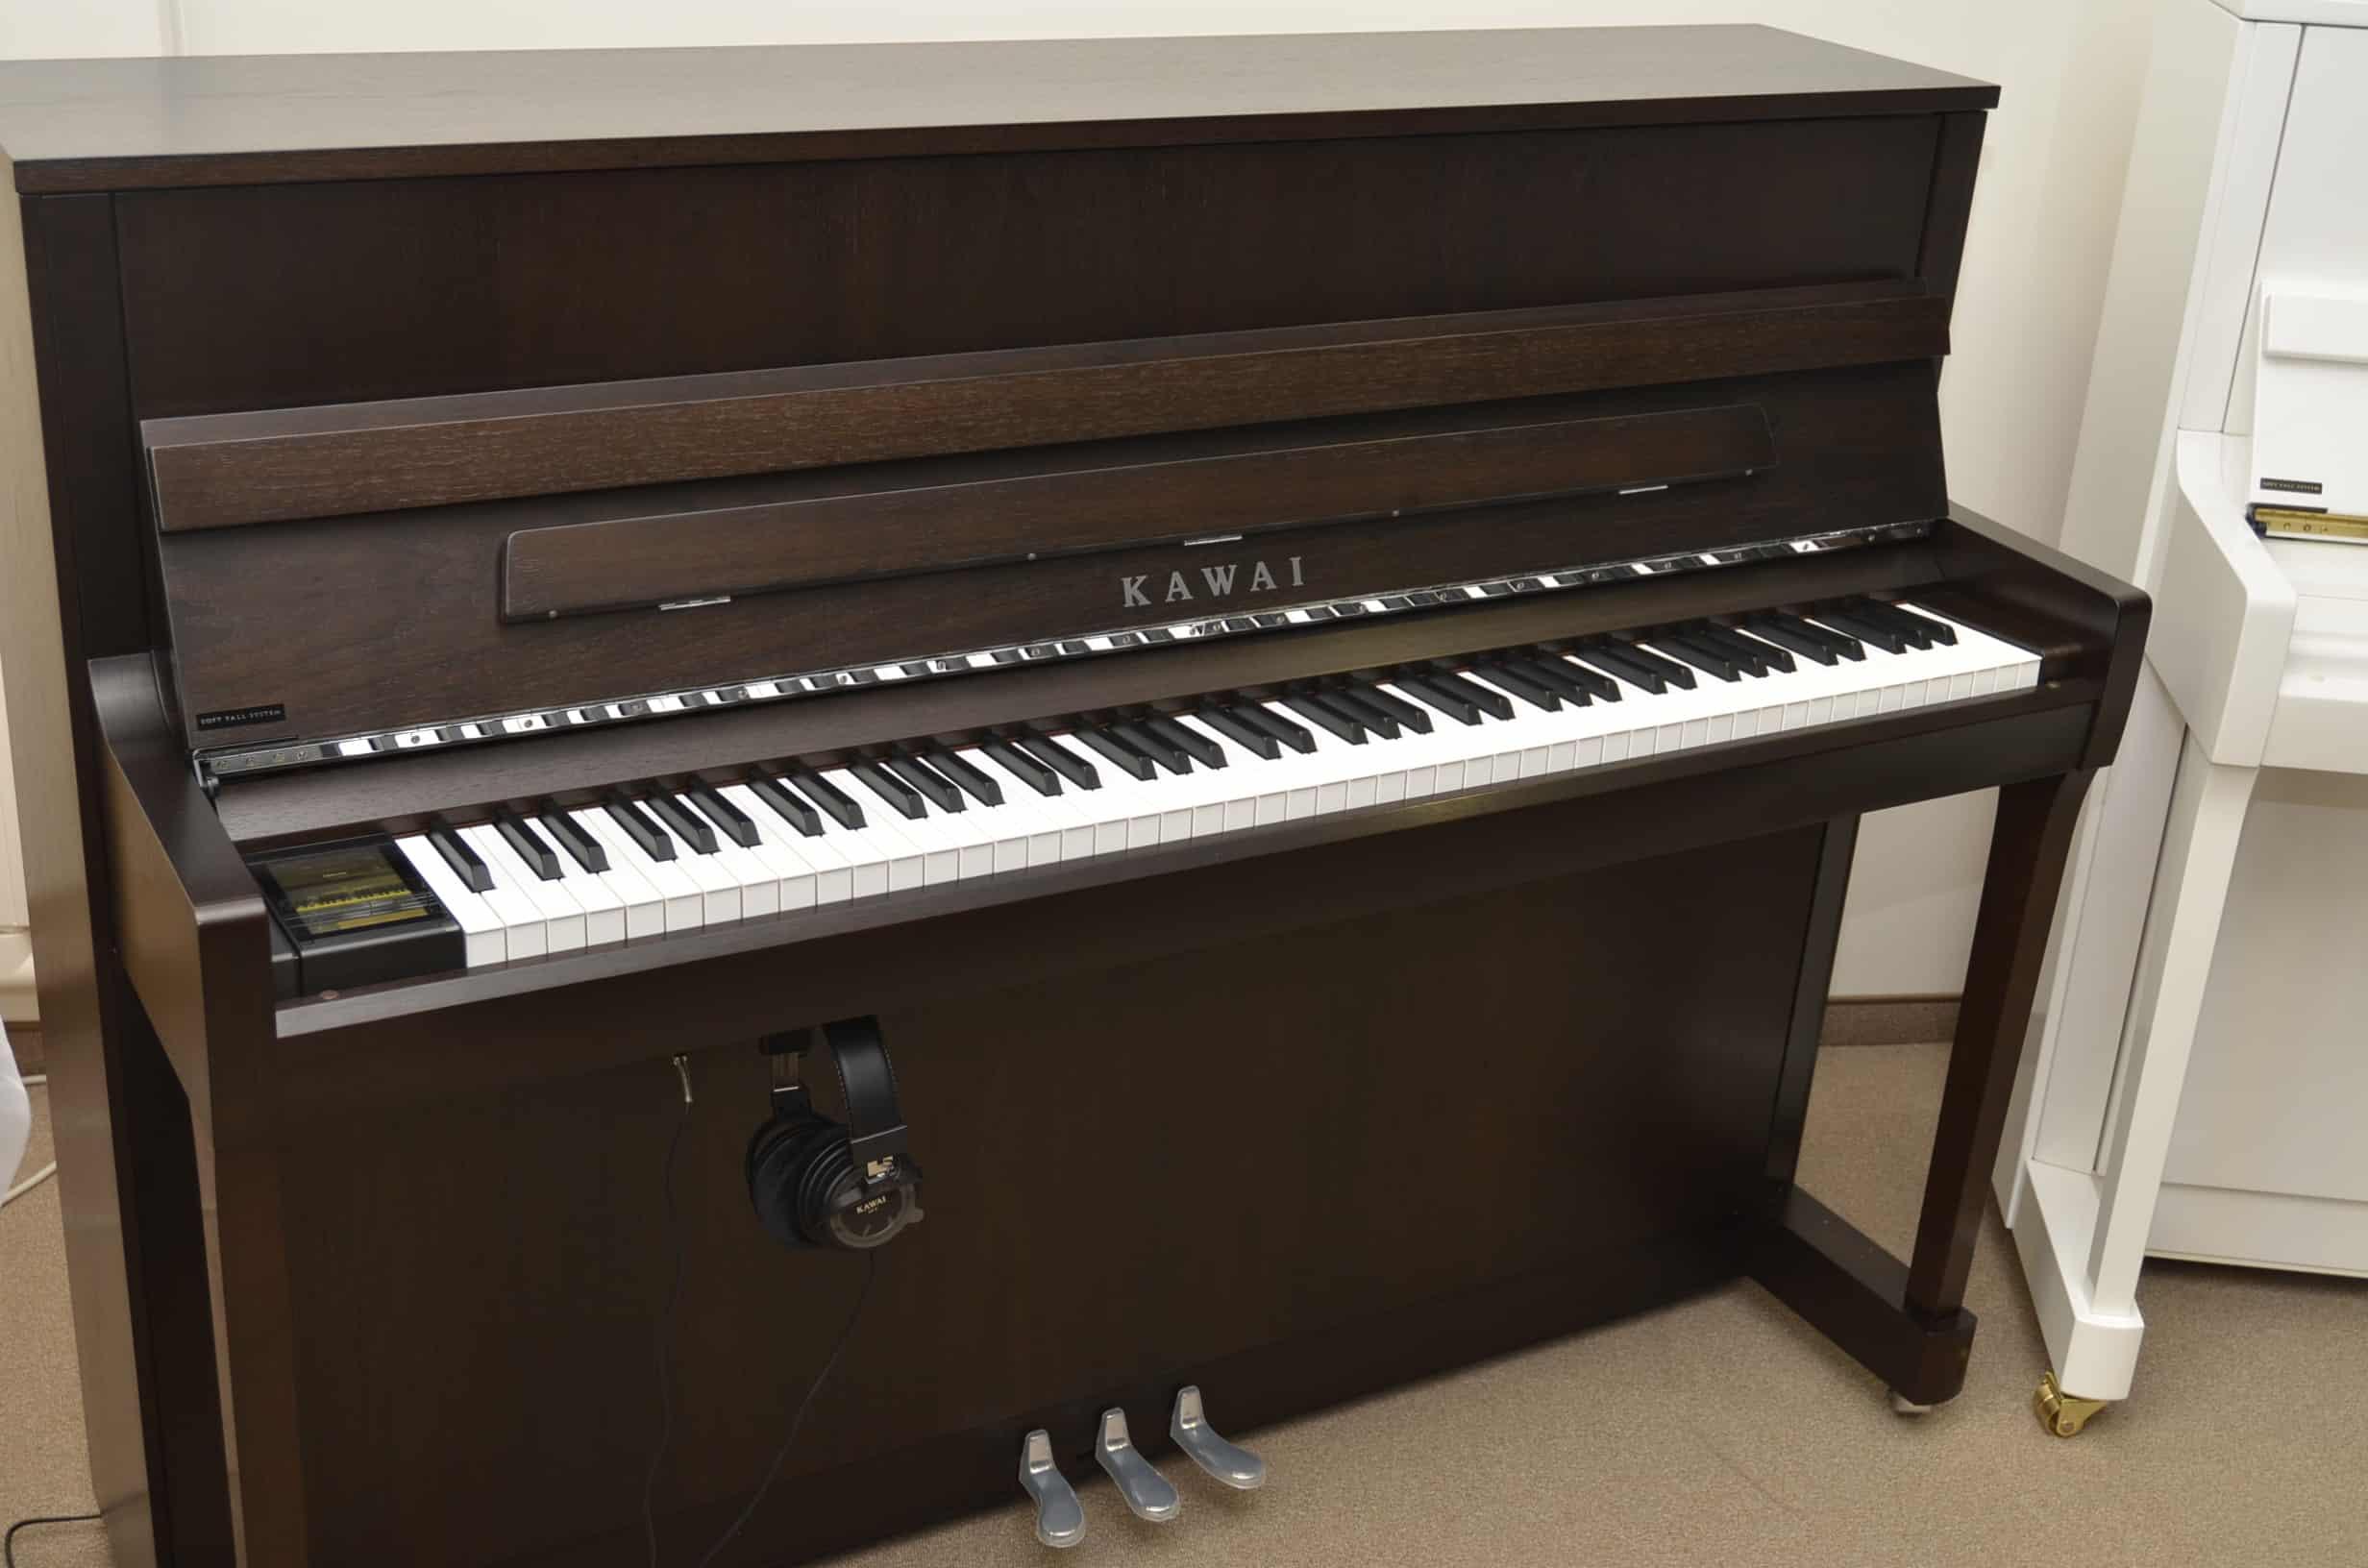 Kawai Klavier K-200 ATX Mokka